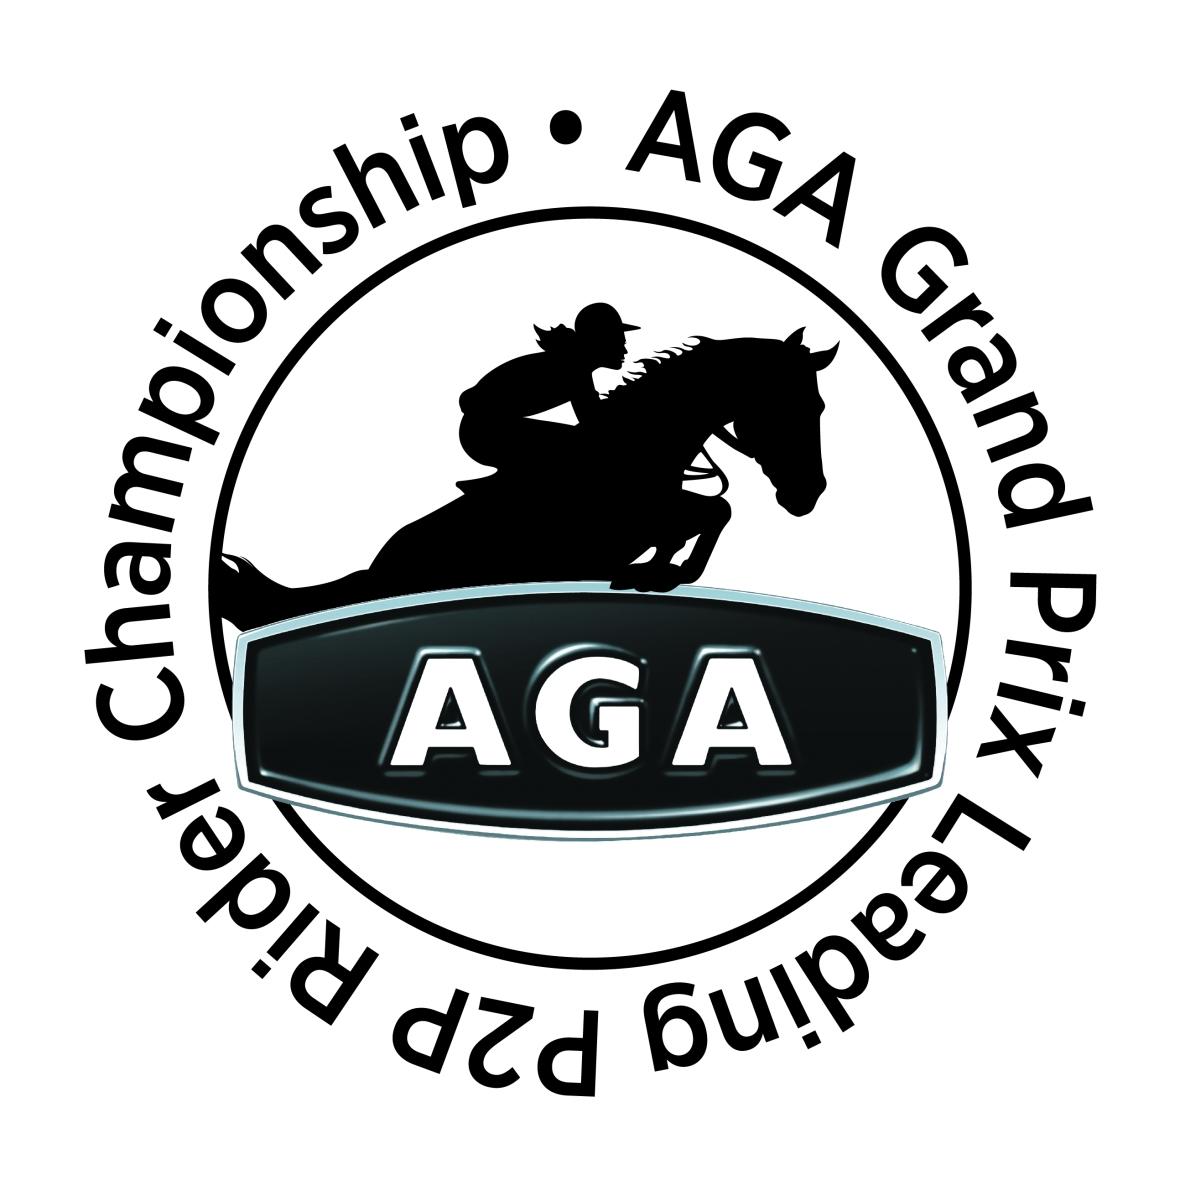 The new championship logo